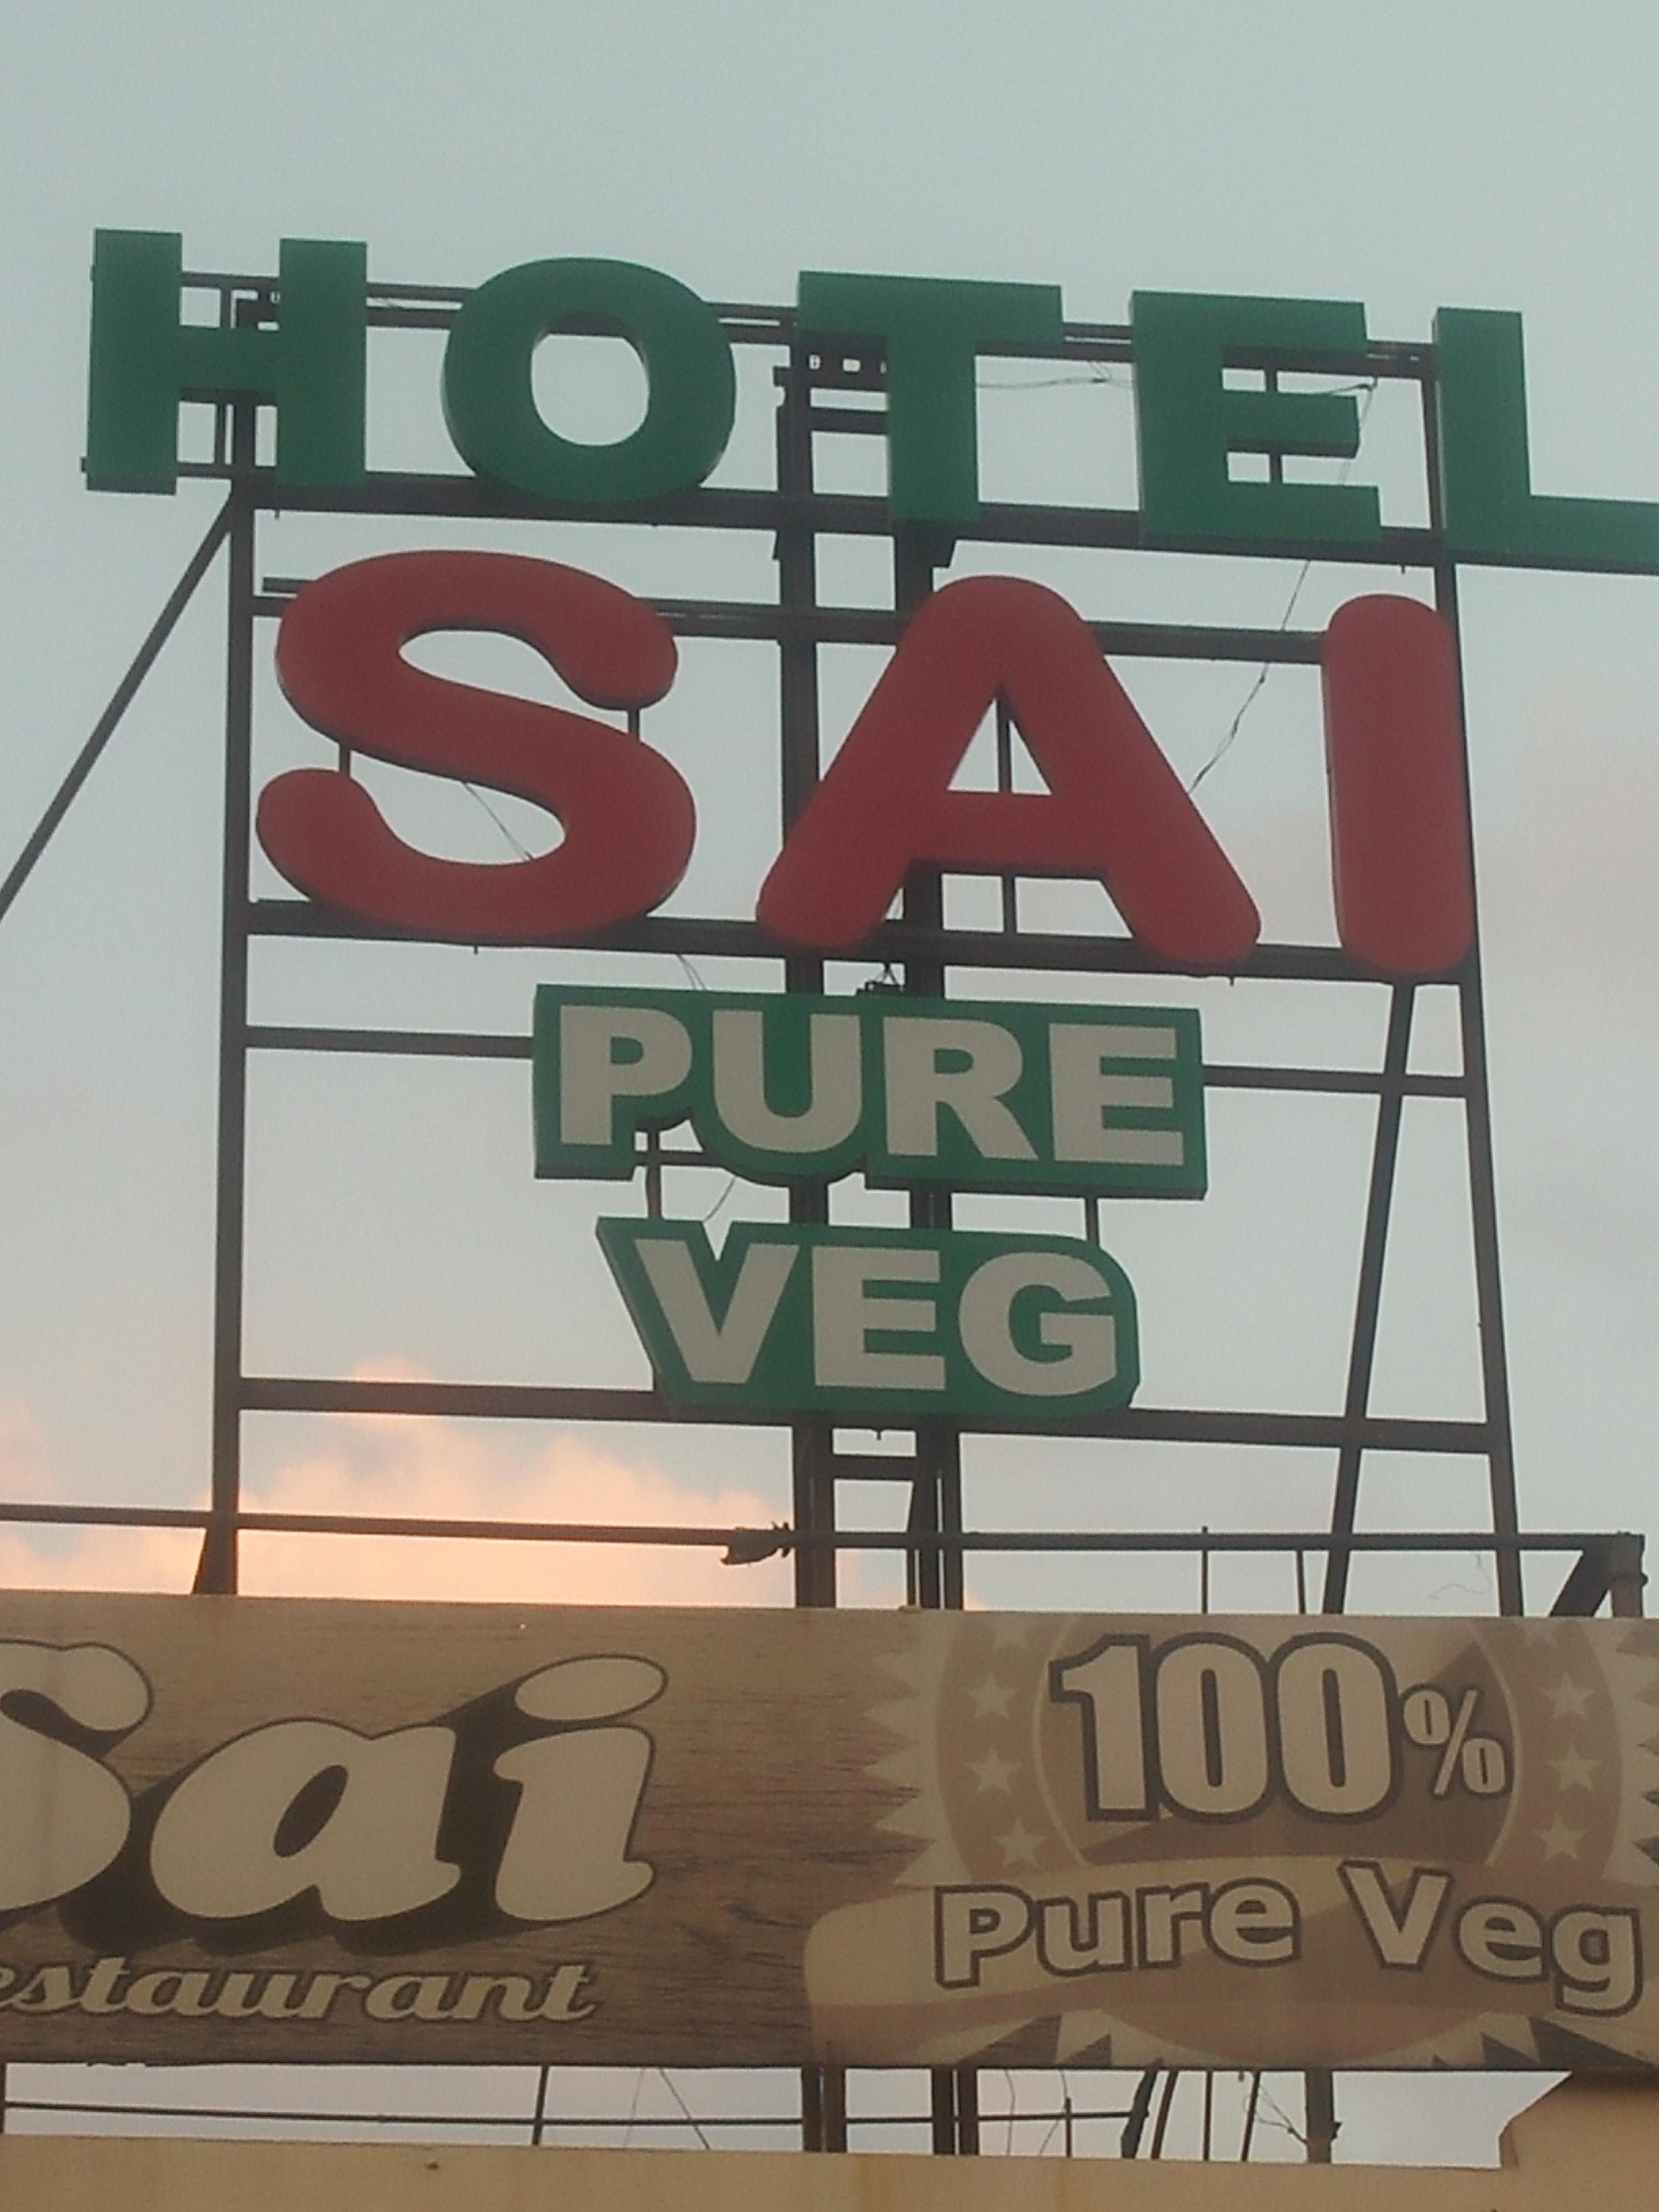 Hotel Sai Pure Veg (A Family Garden Restaurant)